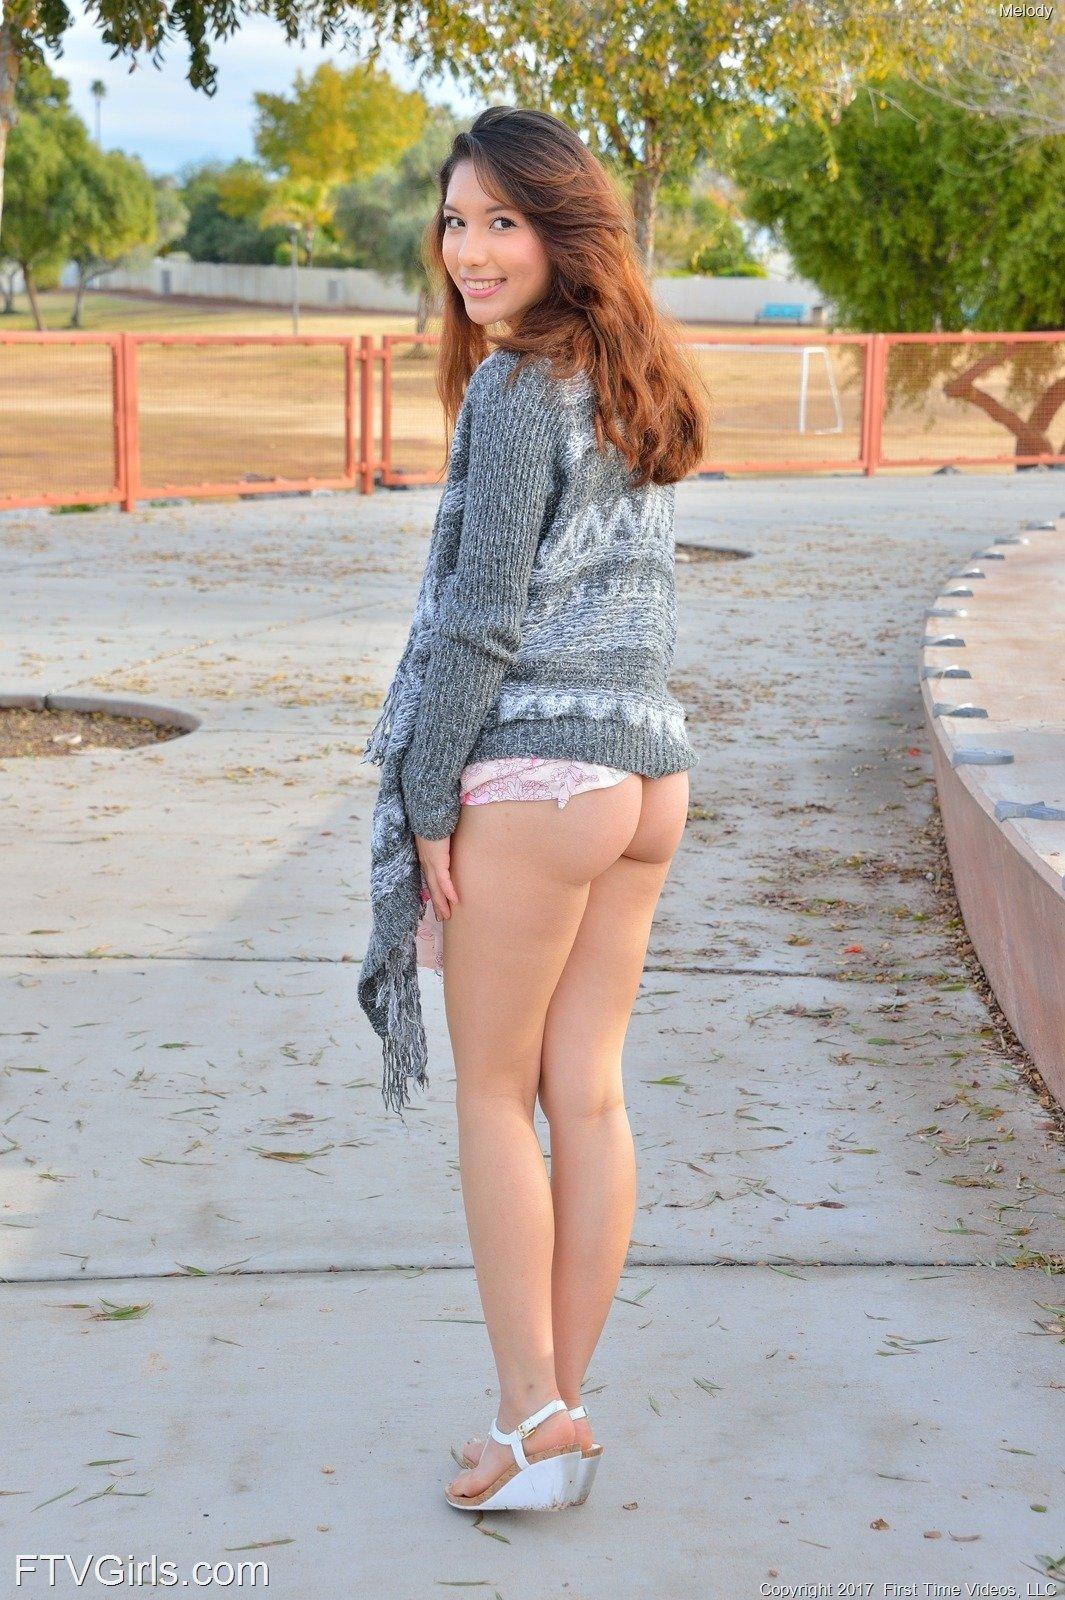 https://cdn.eroticbeauties.net/content/ftvgirls_7532_melody_at-the-playground/full/10.jpg